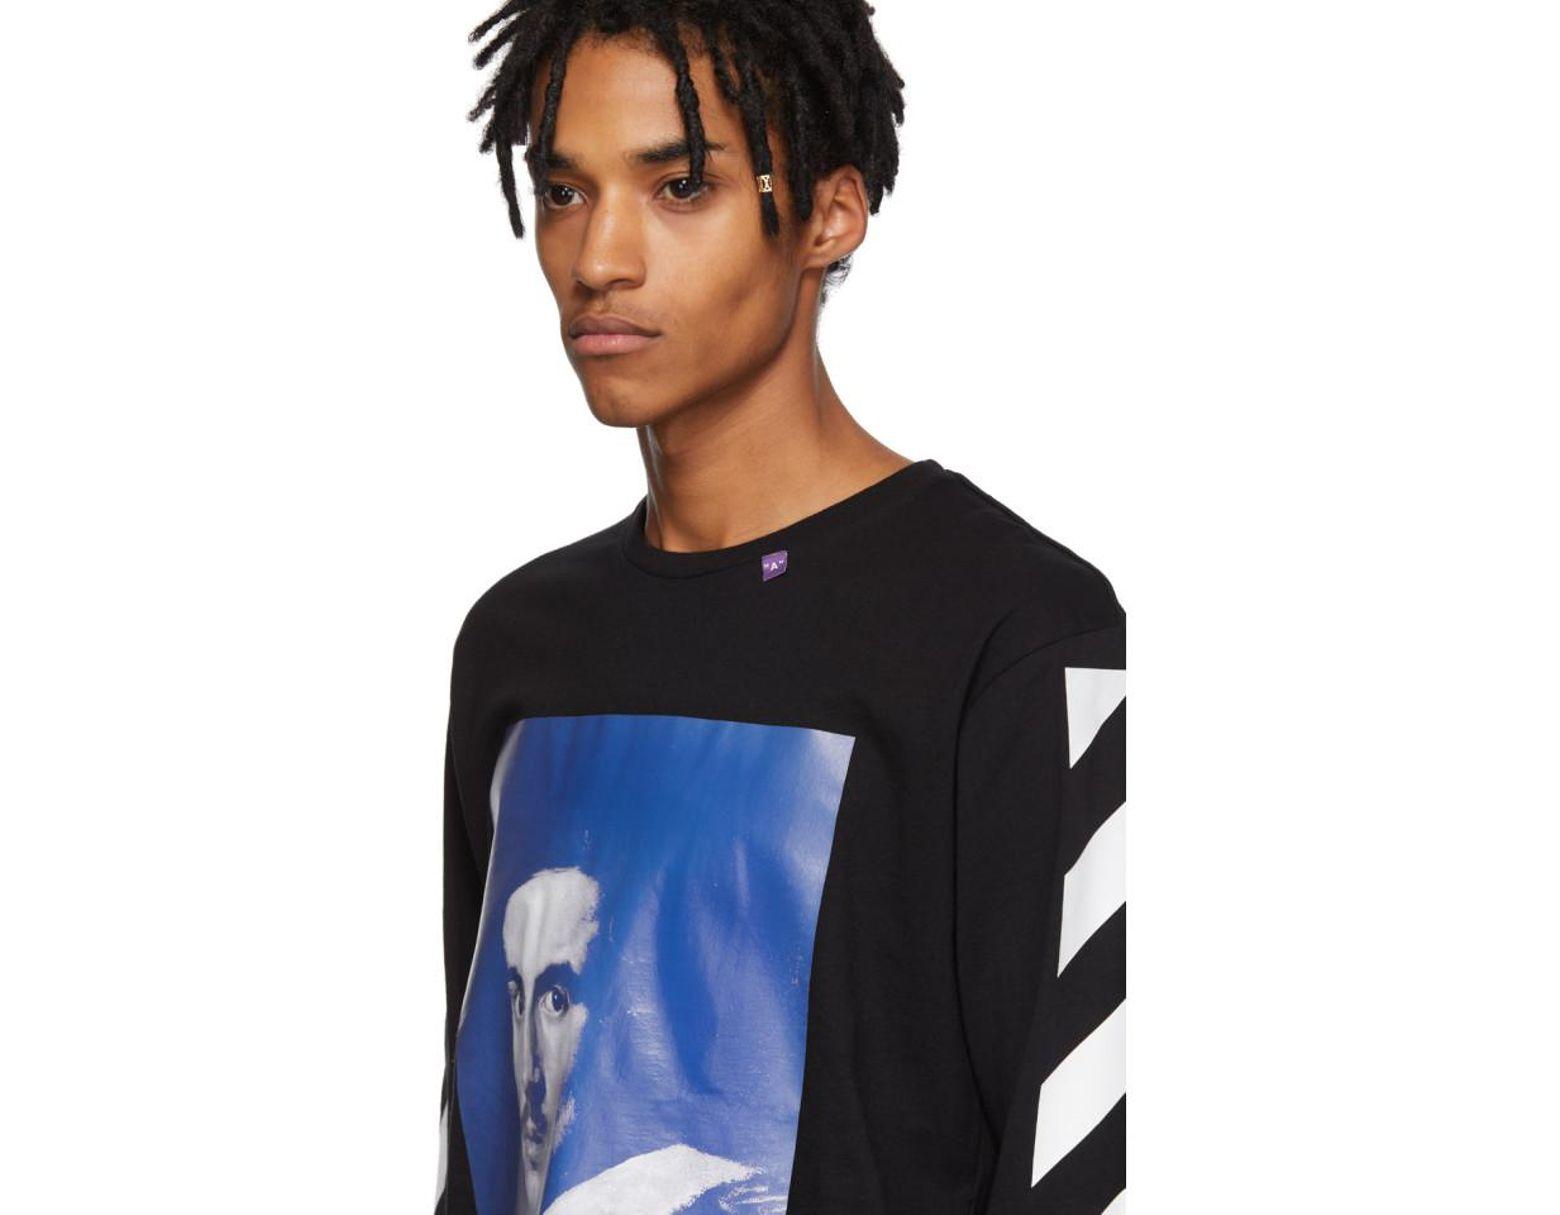 aa5b4fc7 Off-White c/o Virgil Abloh Black Diagonal Bernini Long Sleeve T-shirt in  Black for Men - Save 70% - Lyst